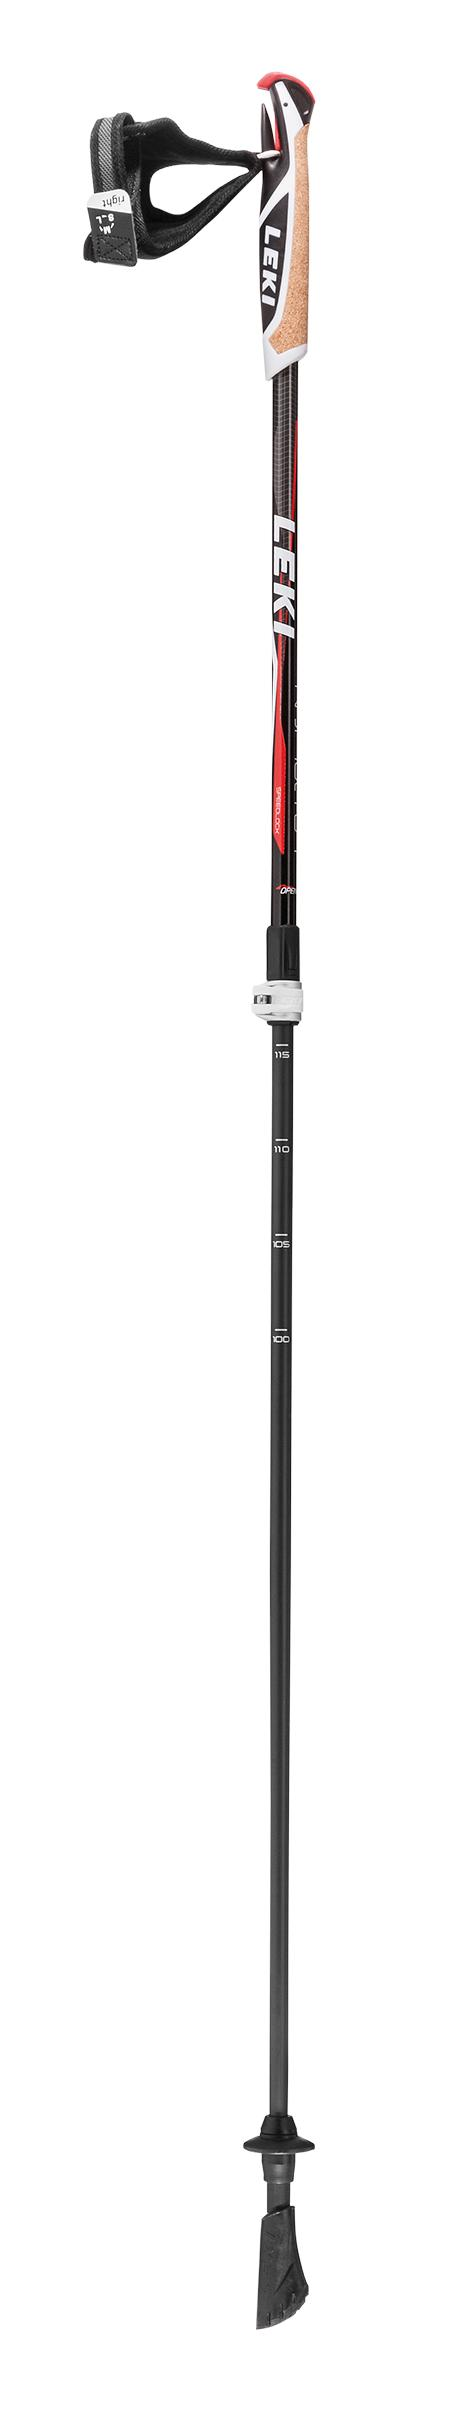 Leki nordic walking hole Instructor Lite